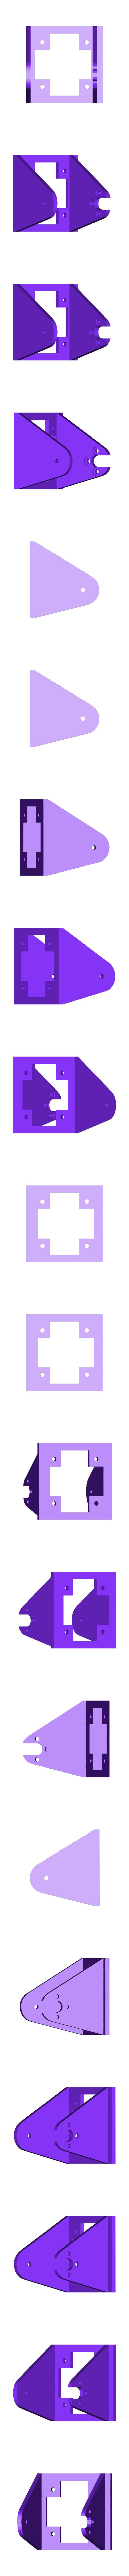 repy1-module-head.stl Download free STL file REPY-1 modules. Version 1.0 • 3D printing model, Ogrod3d